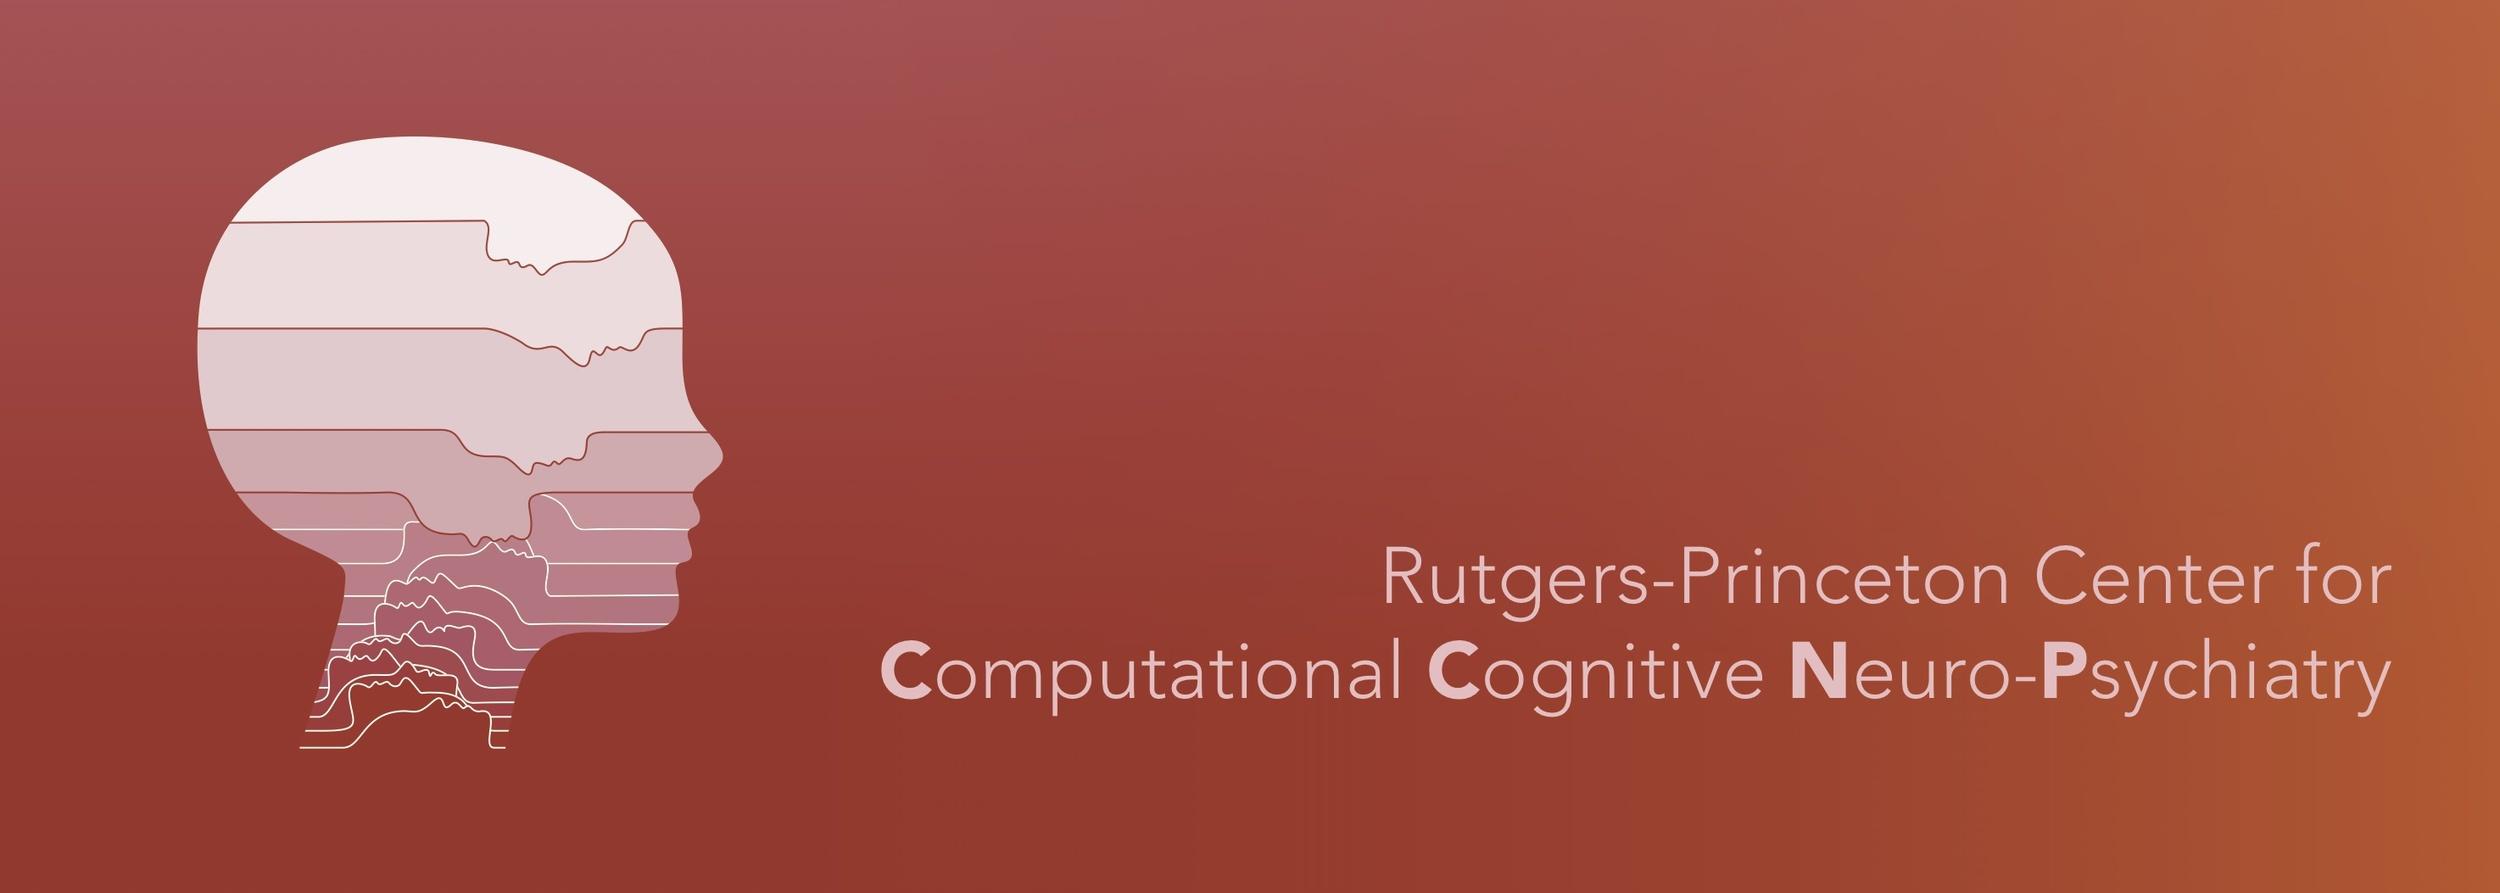 Rutgers-Princeton Center for Cognitive Neuro-Psychiatry  https://ccnp.princeton.edu/